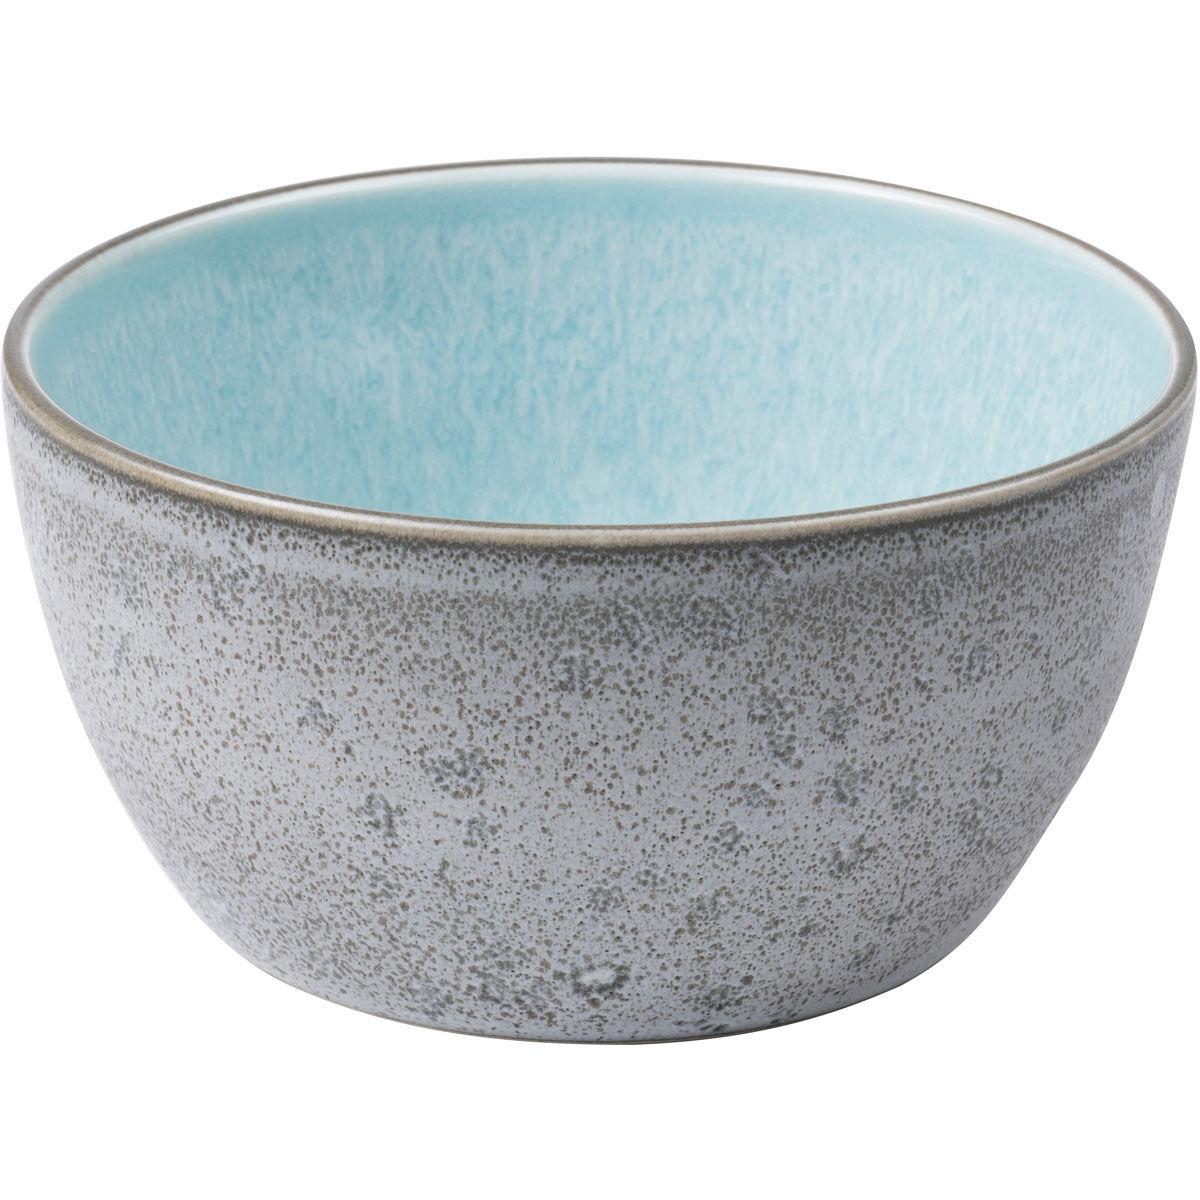 Bitz Bitz Bowl 14 cm, Grey/Light Blue